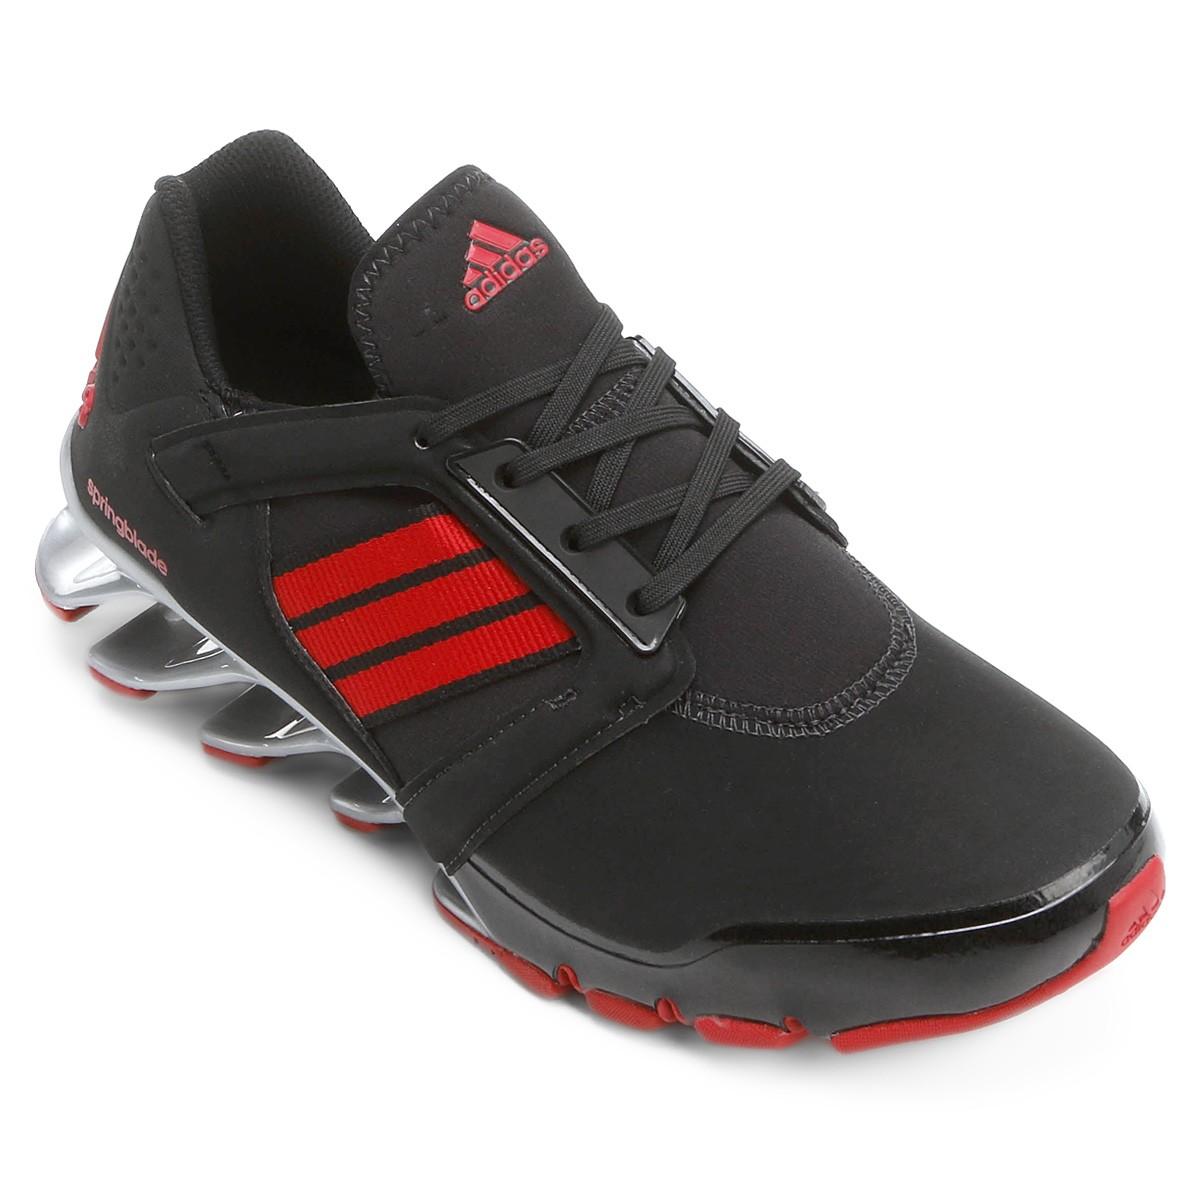 Tenis Adidas Springblade H68448  0313f0c5900cb